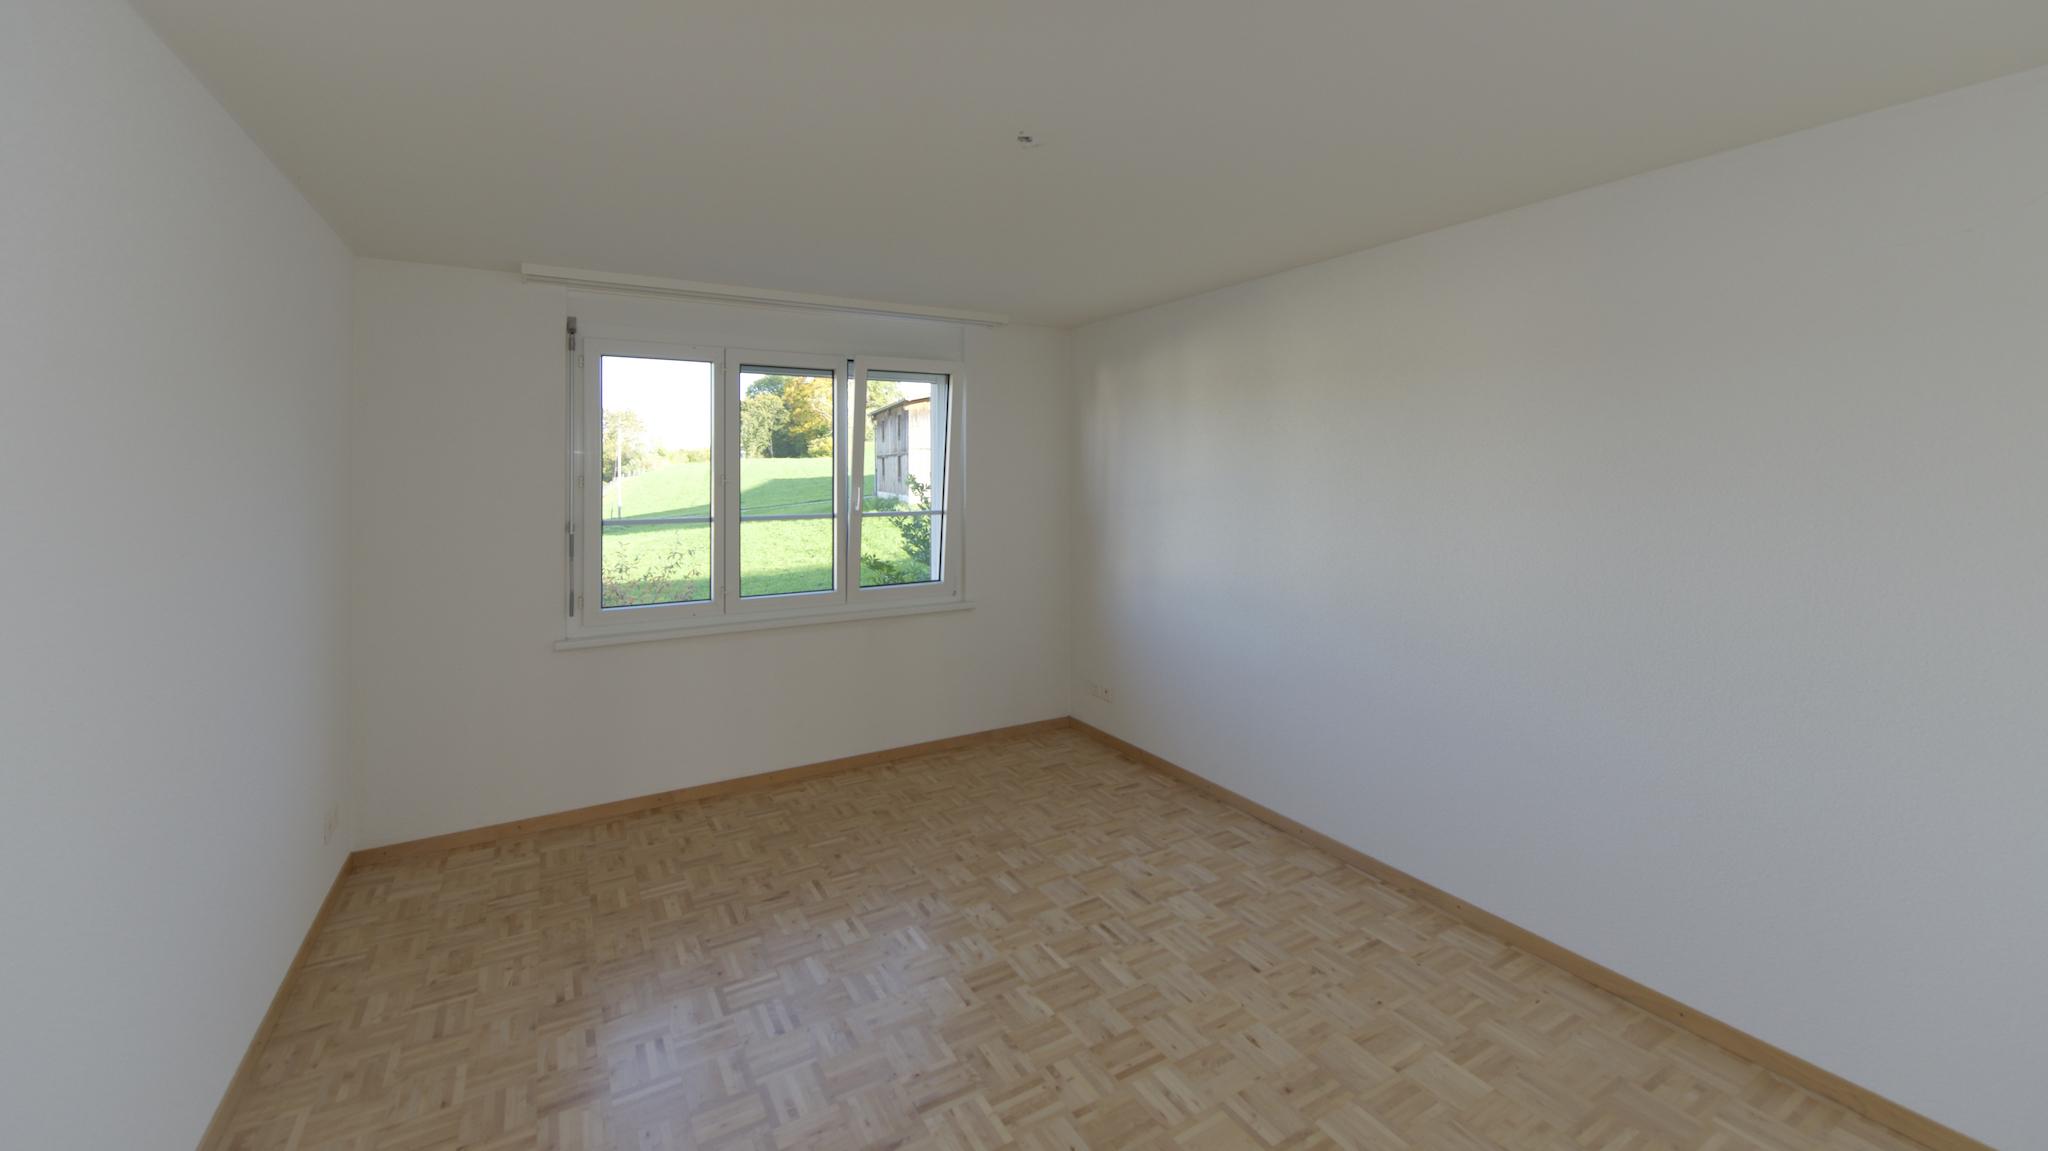 Ostzimmer 2 (Elternzimmer)